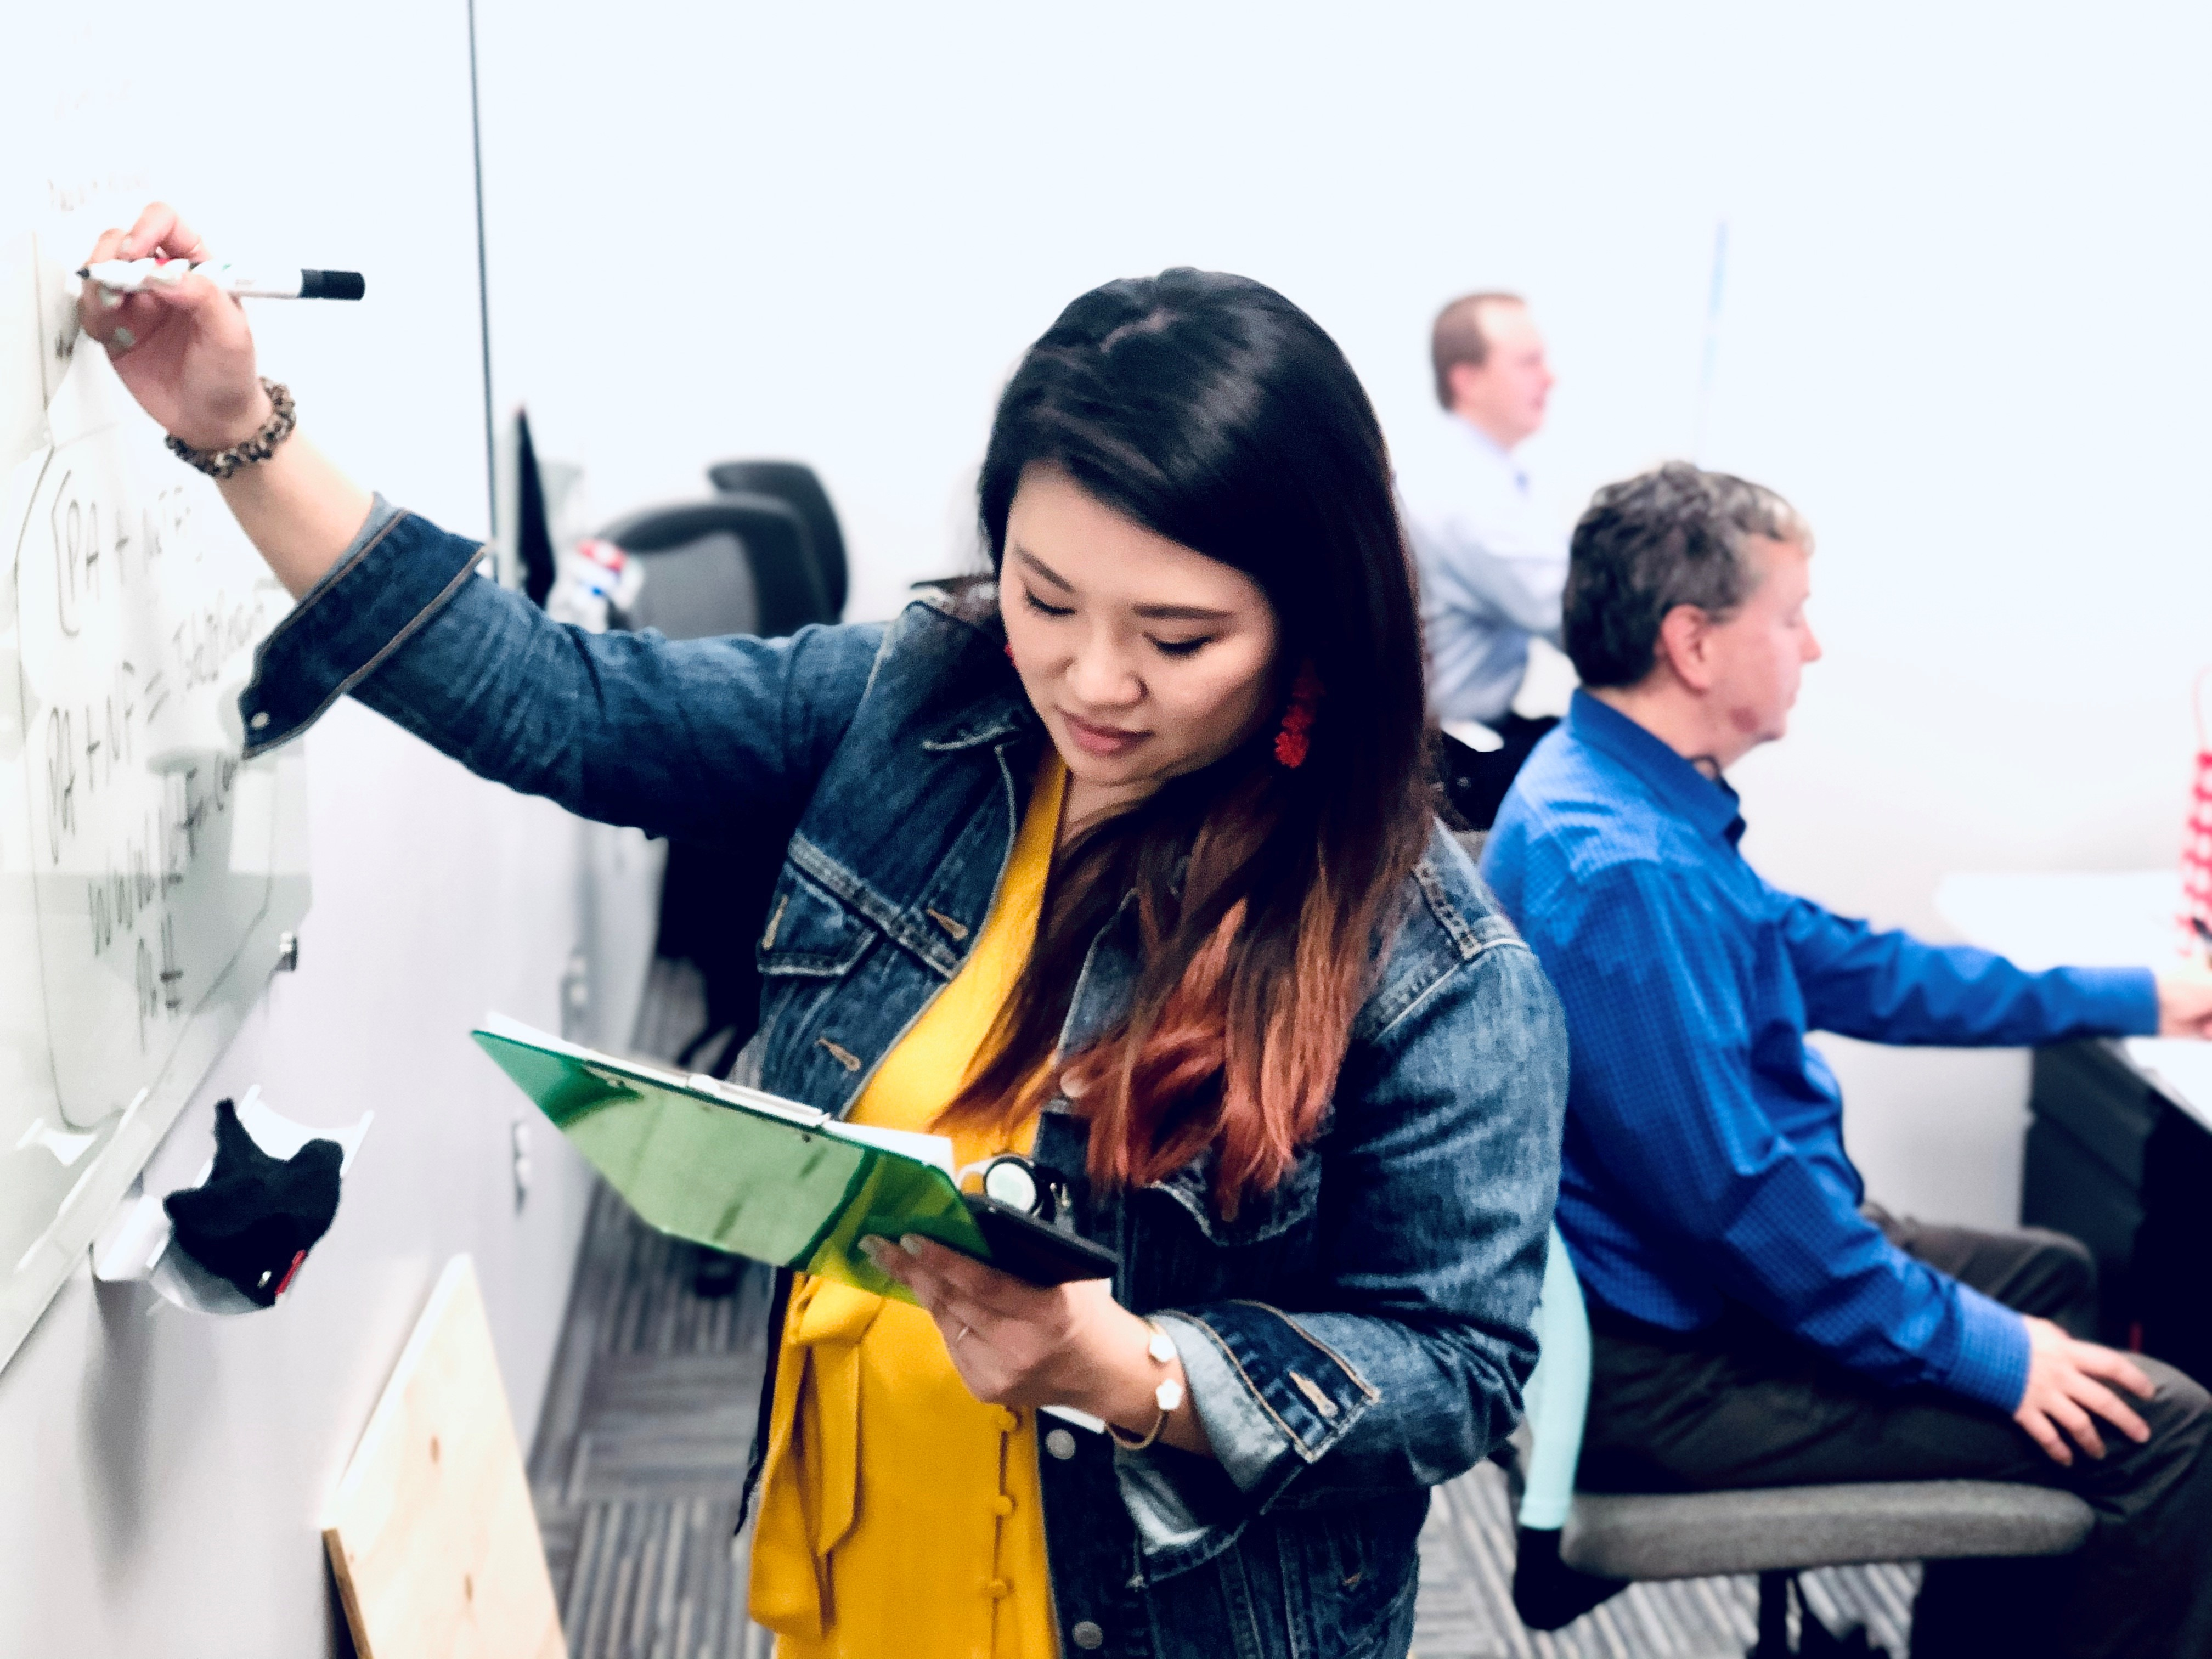 Net Friends team member Emily sharing ideas on the whiteboard